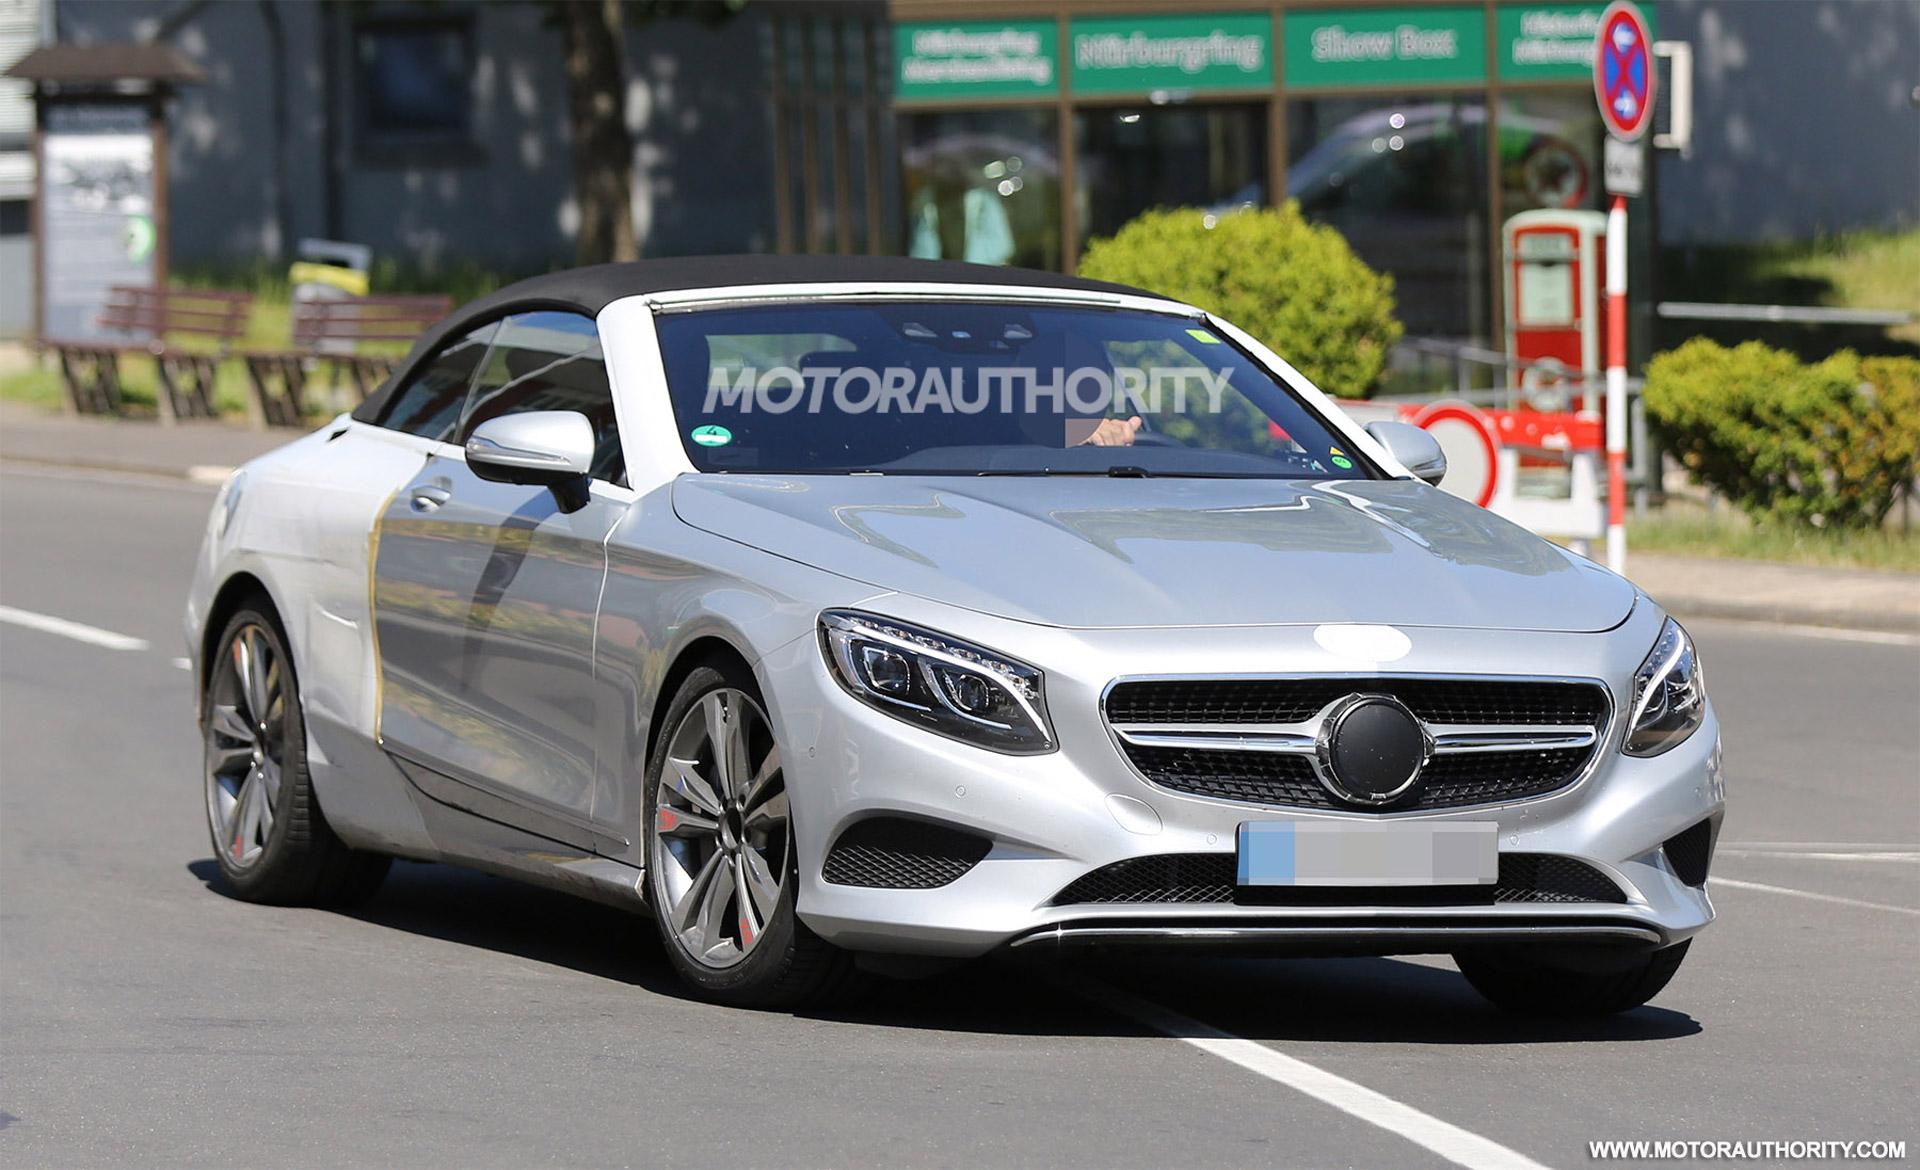 2017 Mercedes-Benz S-Class Cabriolet Spy Shots